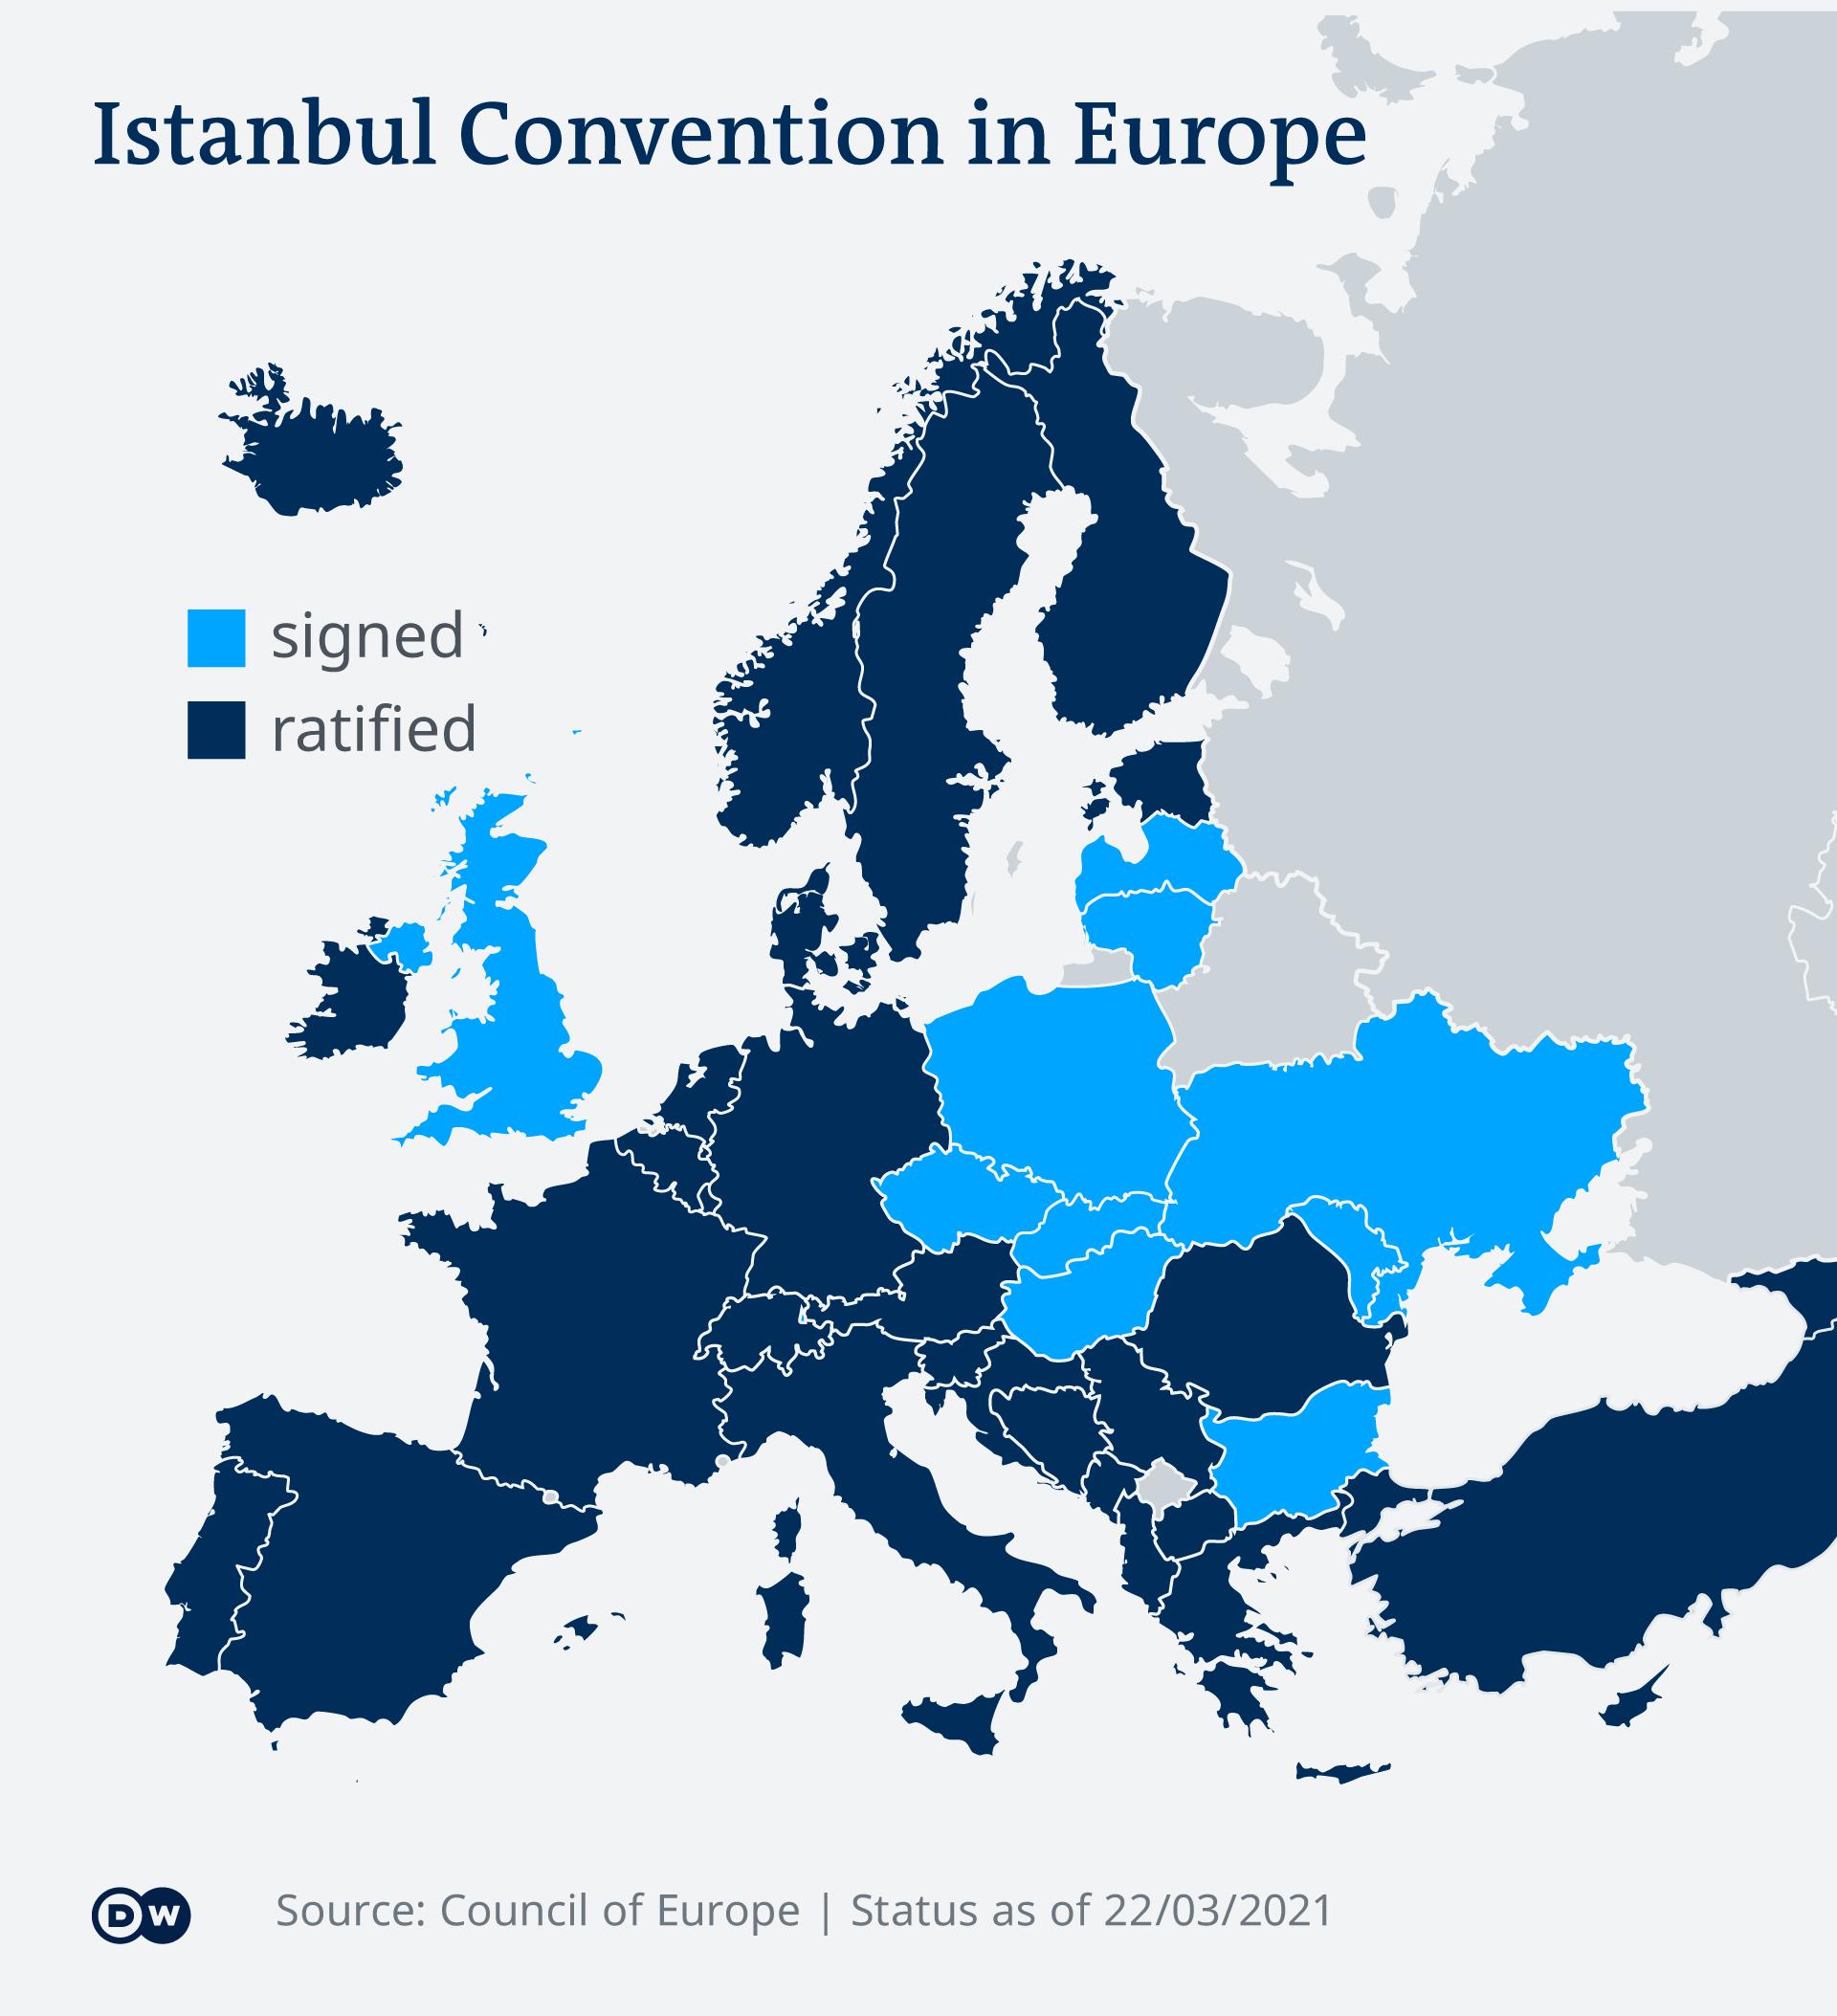 Negara yang meratifikasi Konvensi Istanbul yang menguatkan hak perempuan melawan kekerasan, pemerkosaan atau pelecehan seksual.